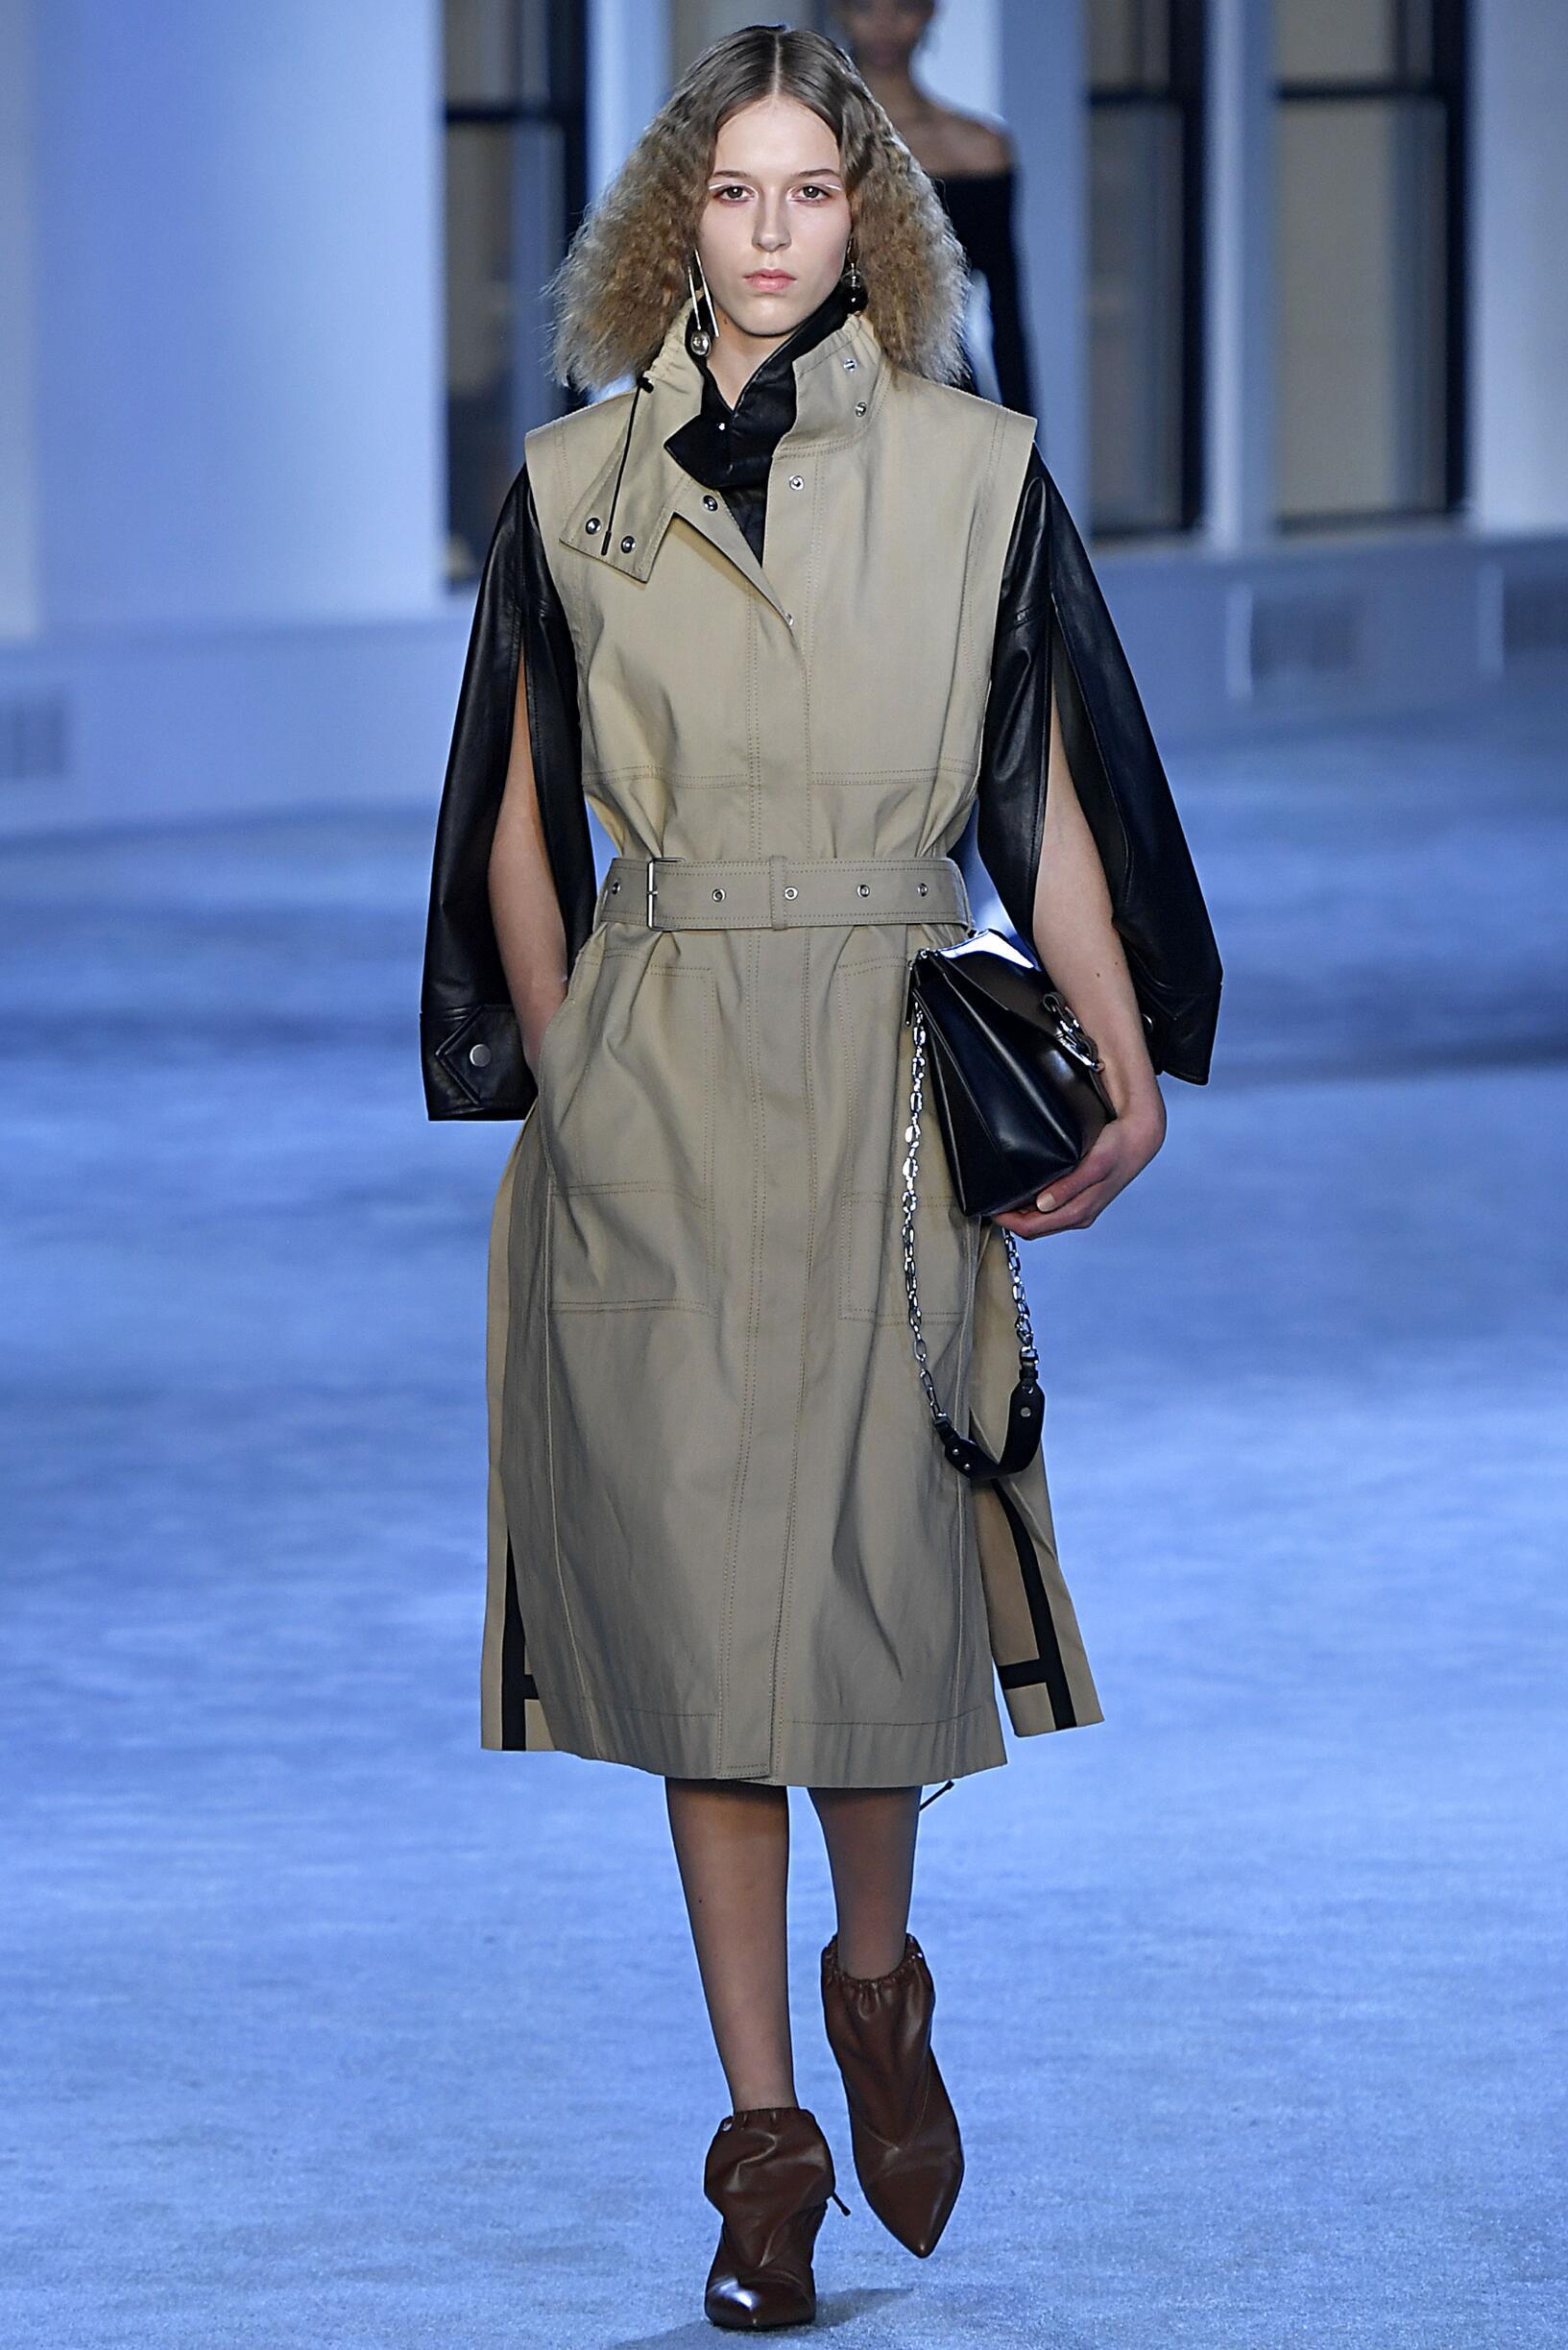 Fashion Show Woman Model 3.1 Phillip Lim Catwalk